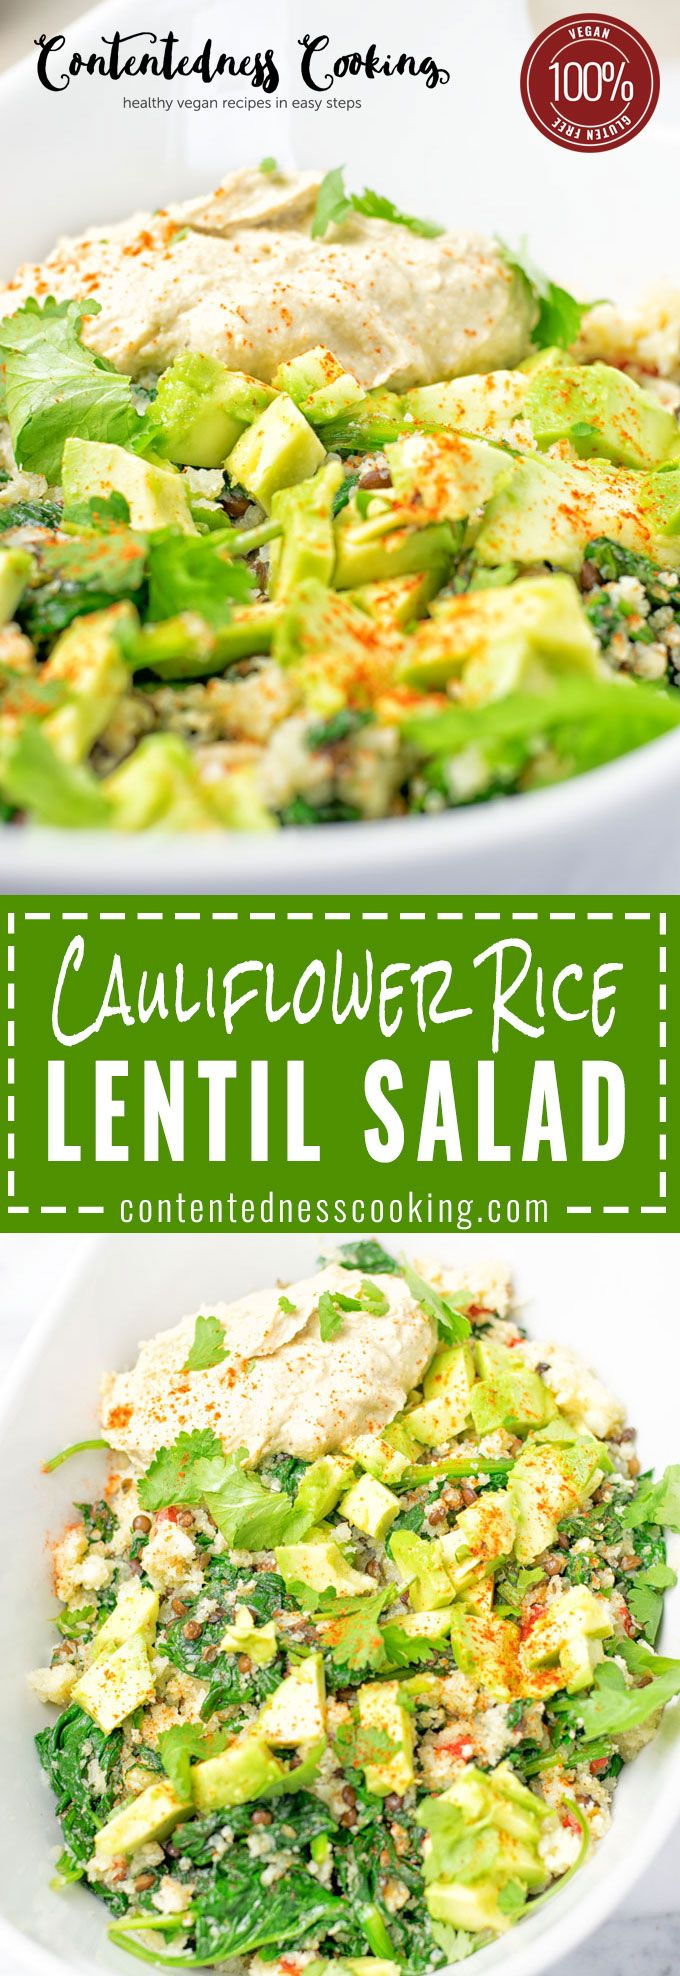 Cauliflower Rice Lentil Salad | #vegan #glutenfree #contentednesscooking